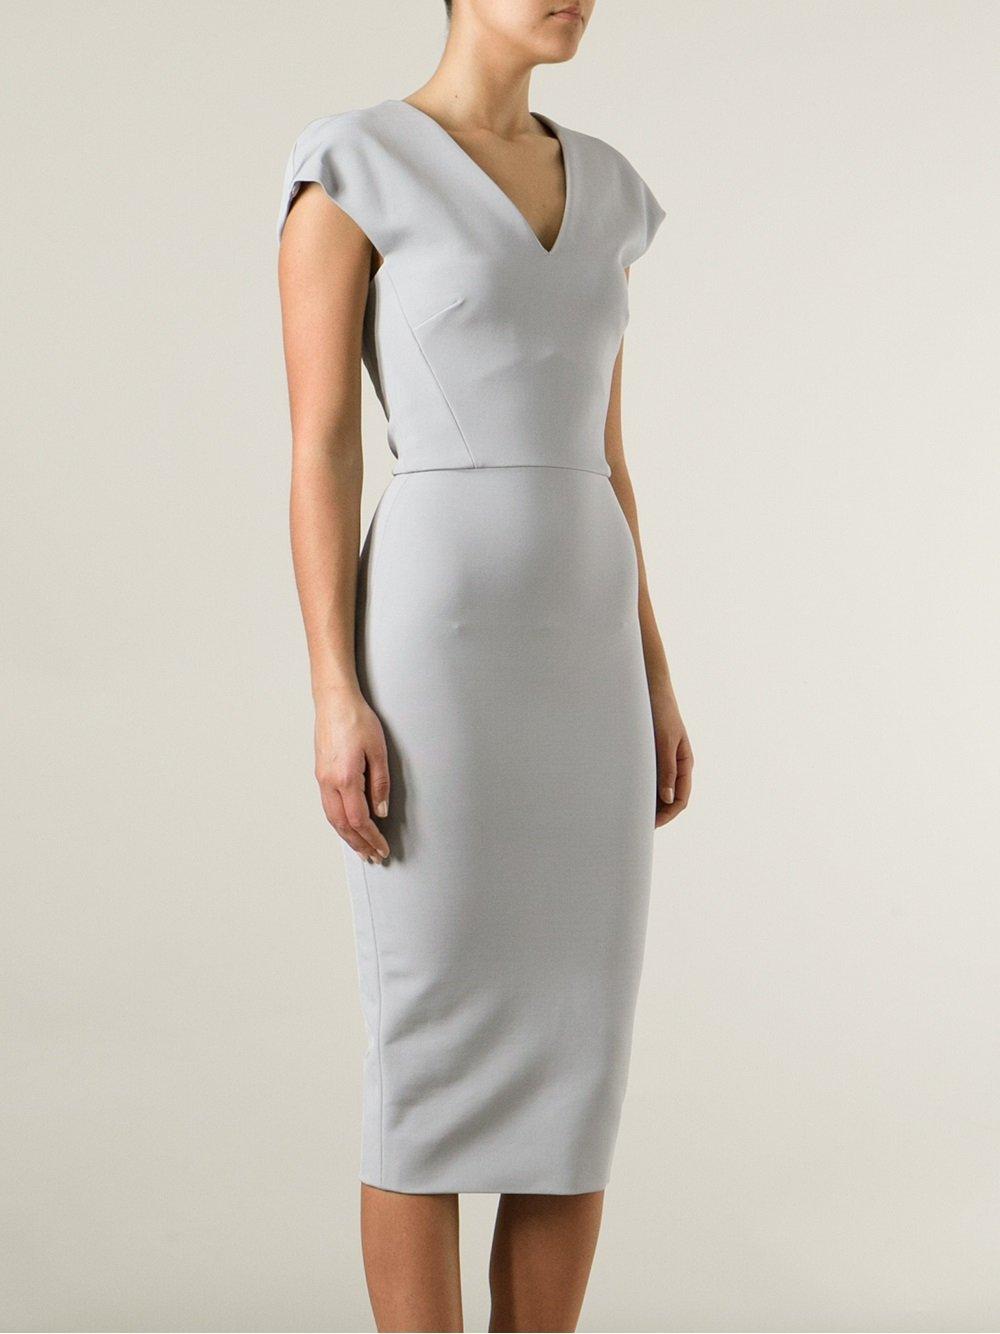 DRESSES - 3/4 length dresses Victoria Beckham jGUbZ